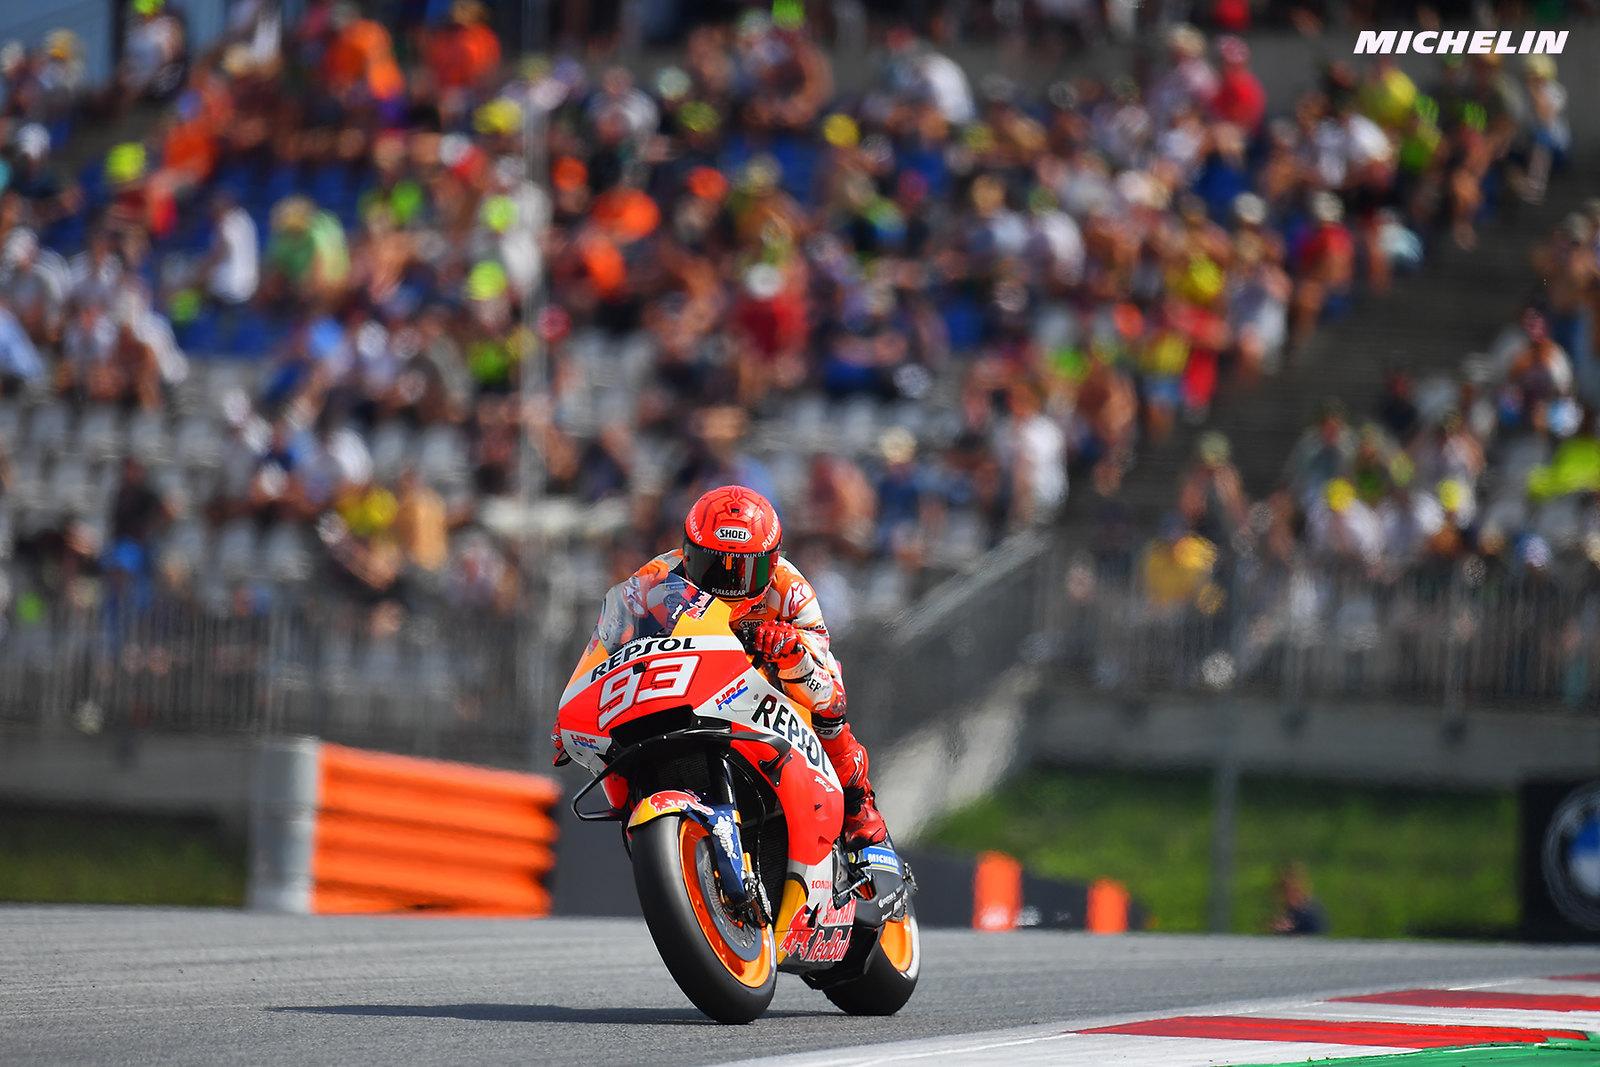 MotoGP2021オーストリアGP マルク・マルケス「今朝興味深い発見があった」